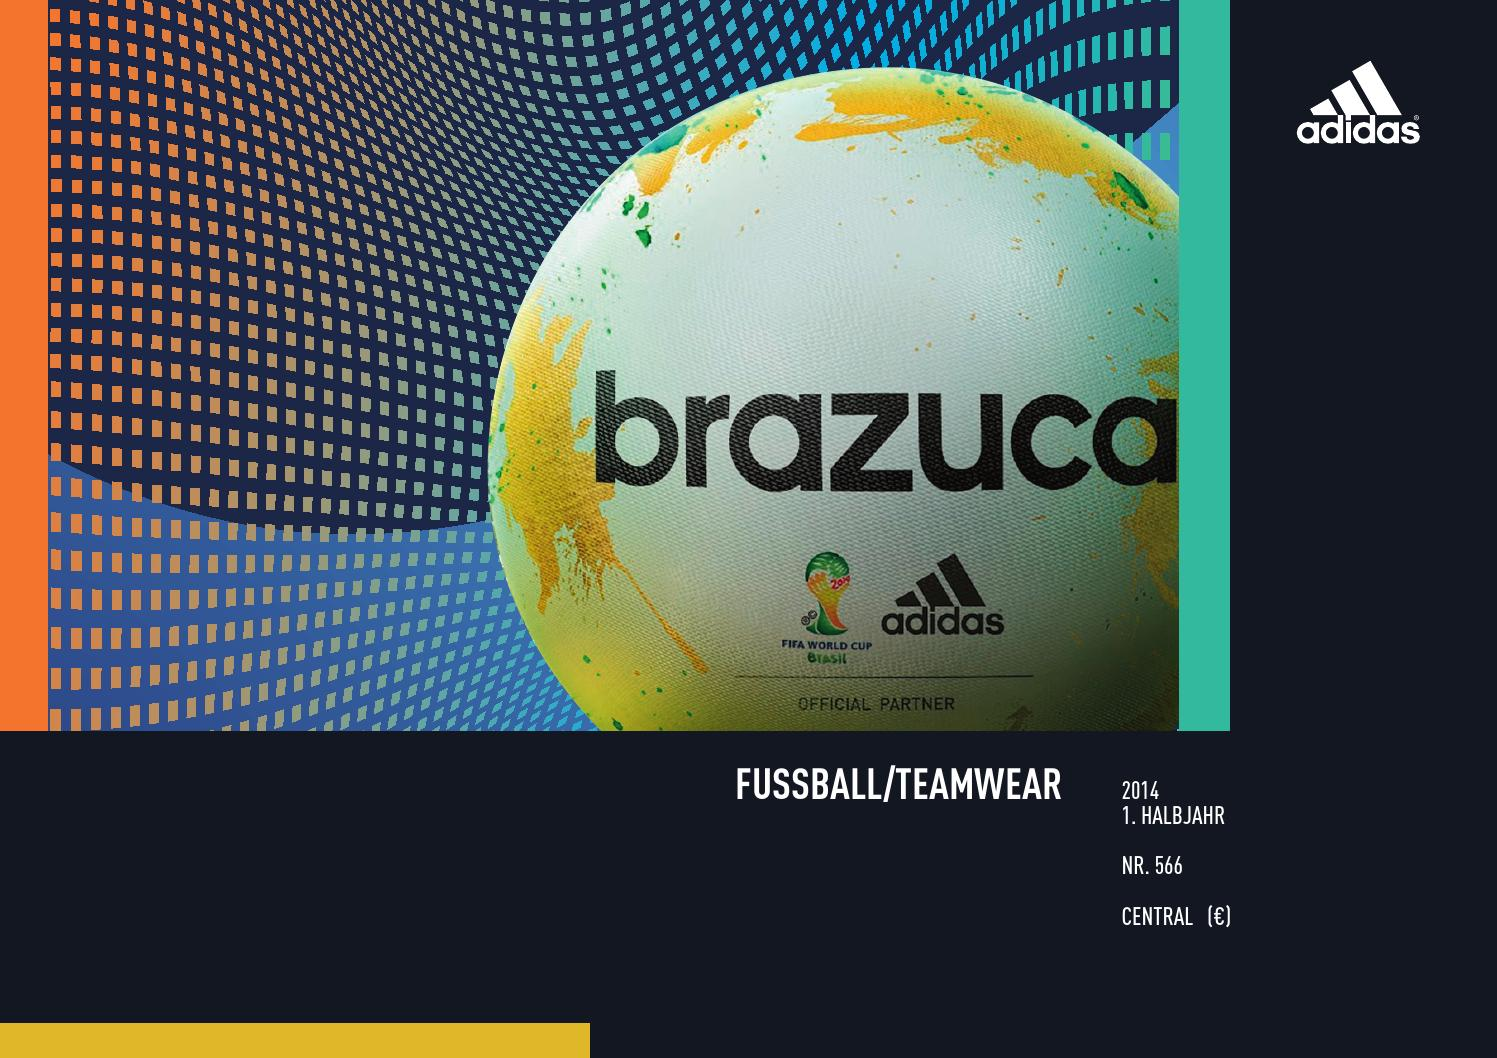 Adidas Teamsport Katalog 20142015 by schmiddesign